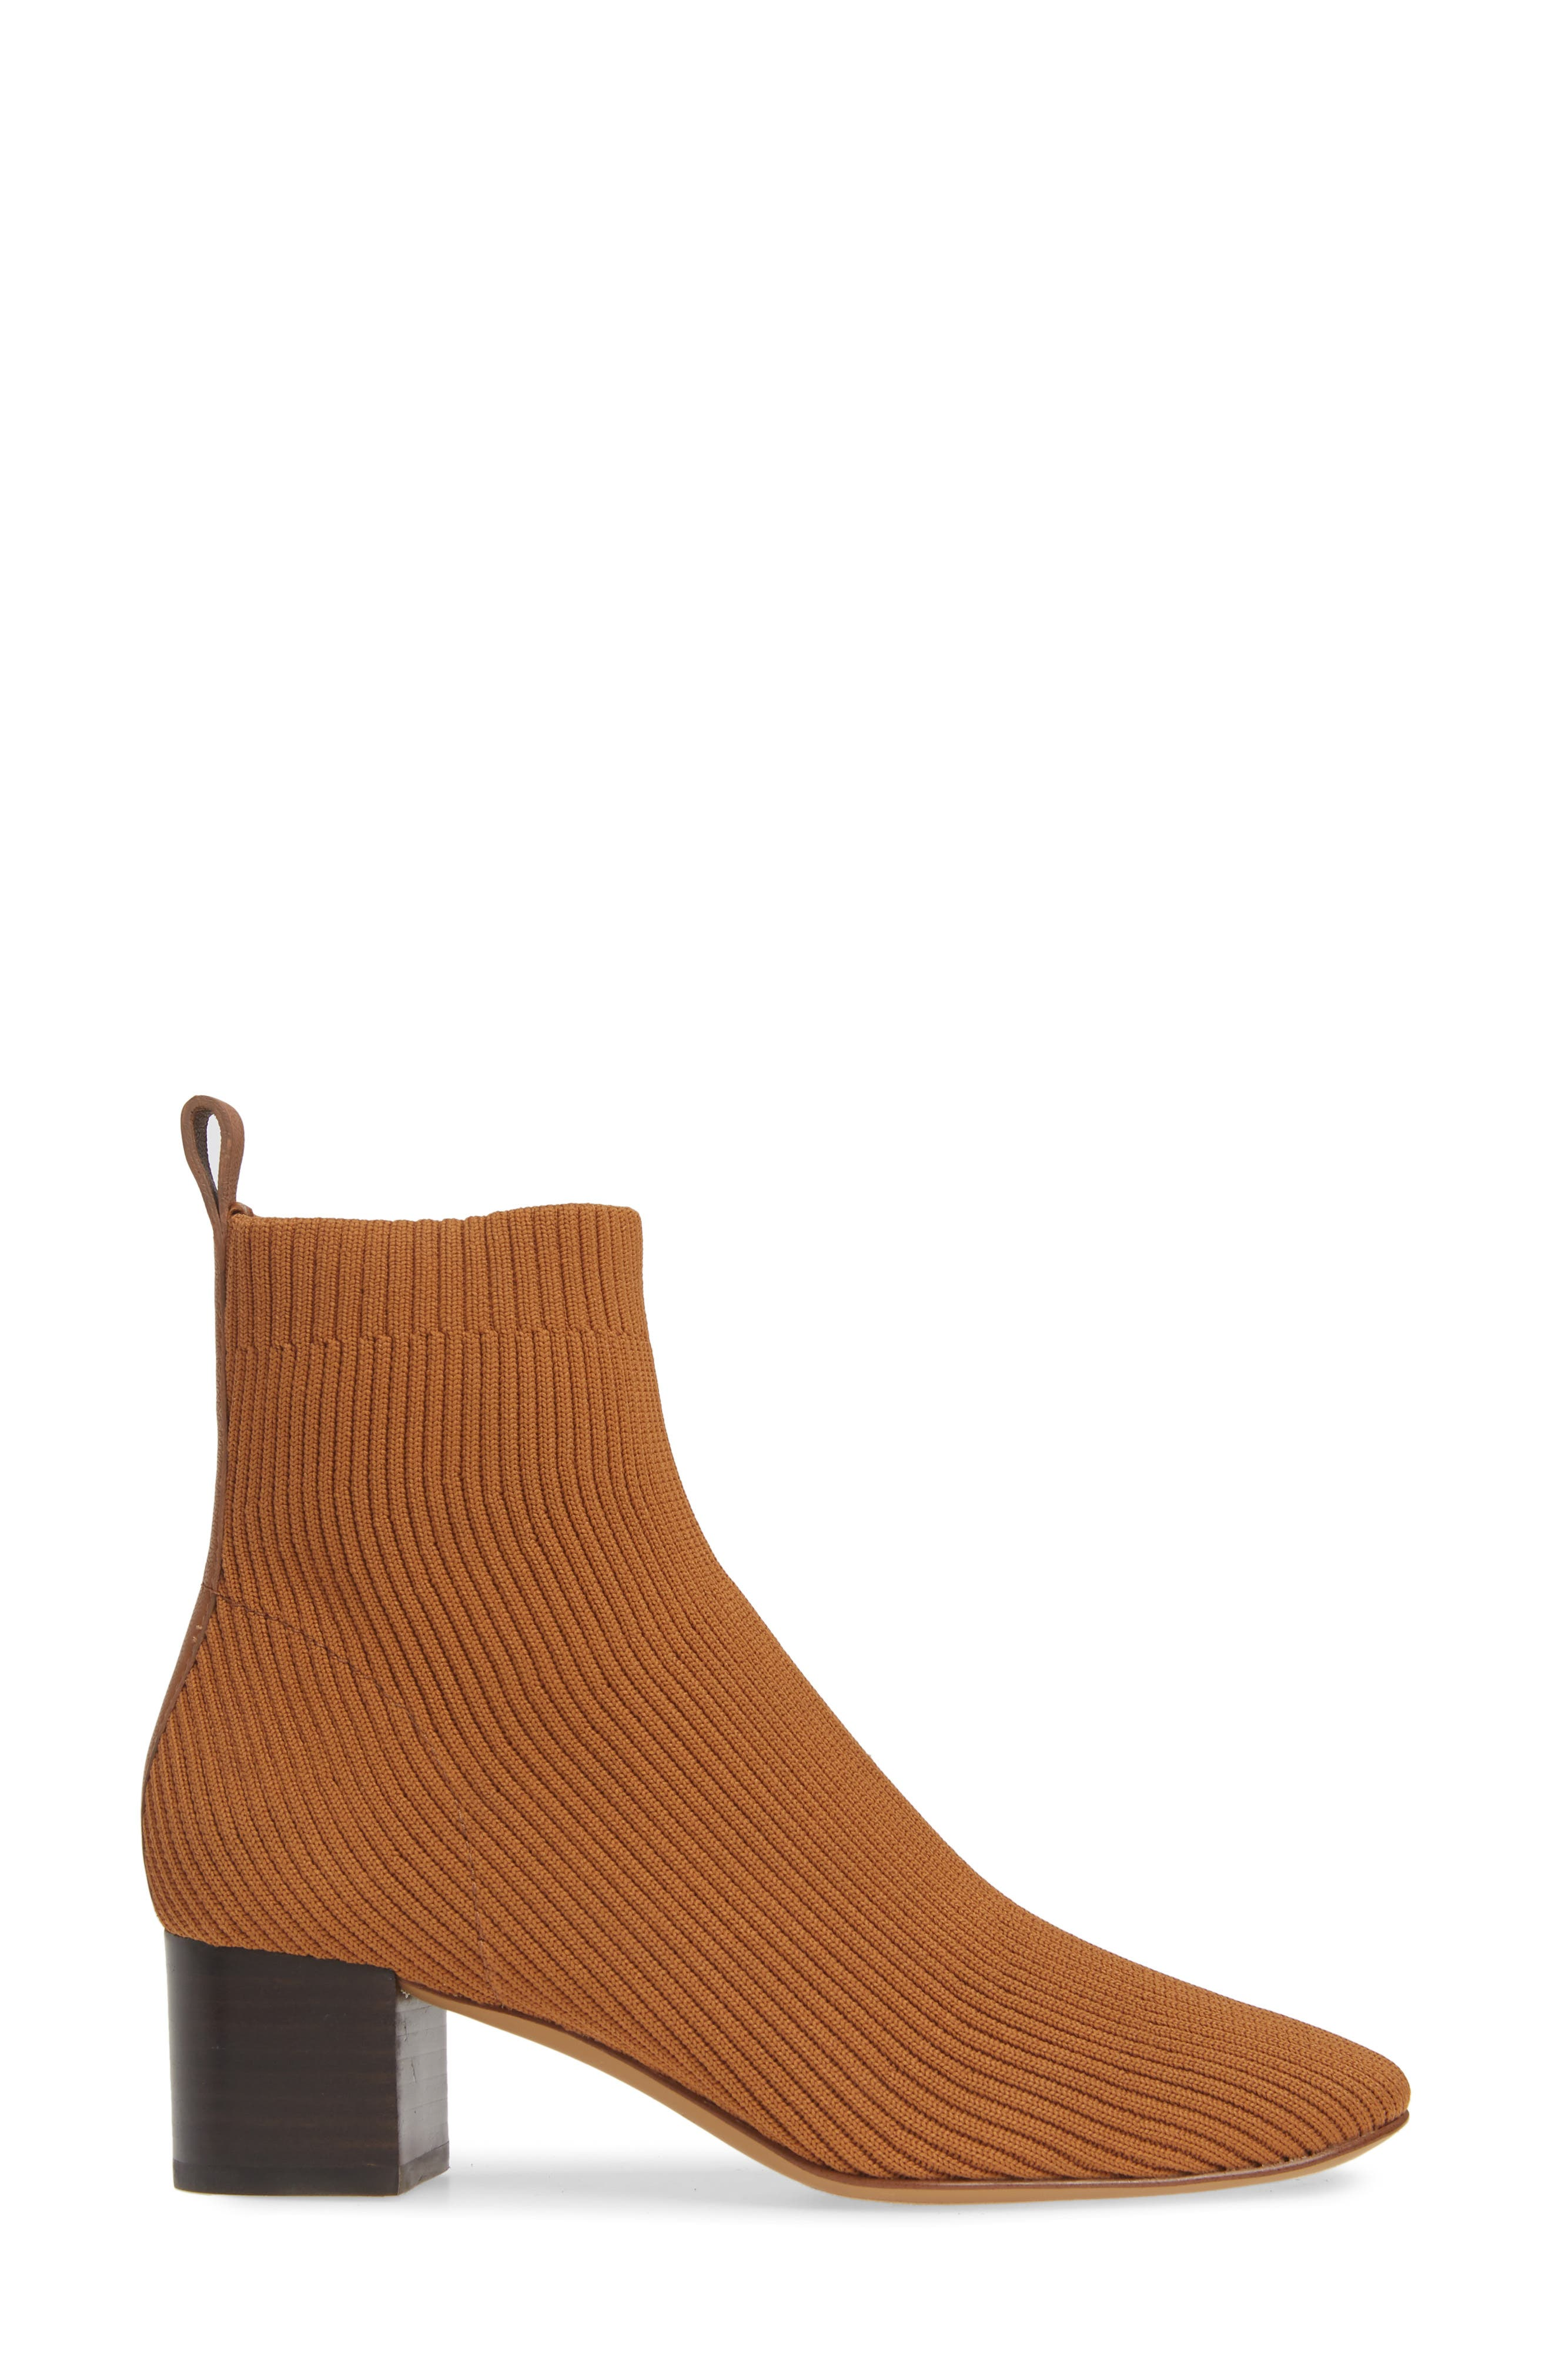 Women's Everlane Shoes | Nordstrom